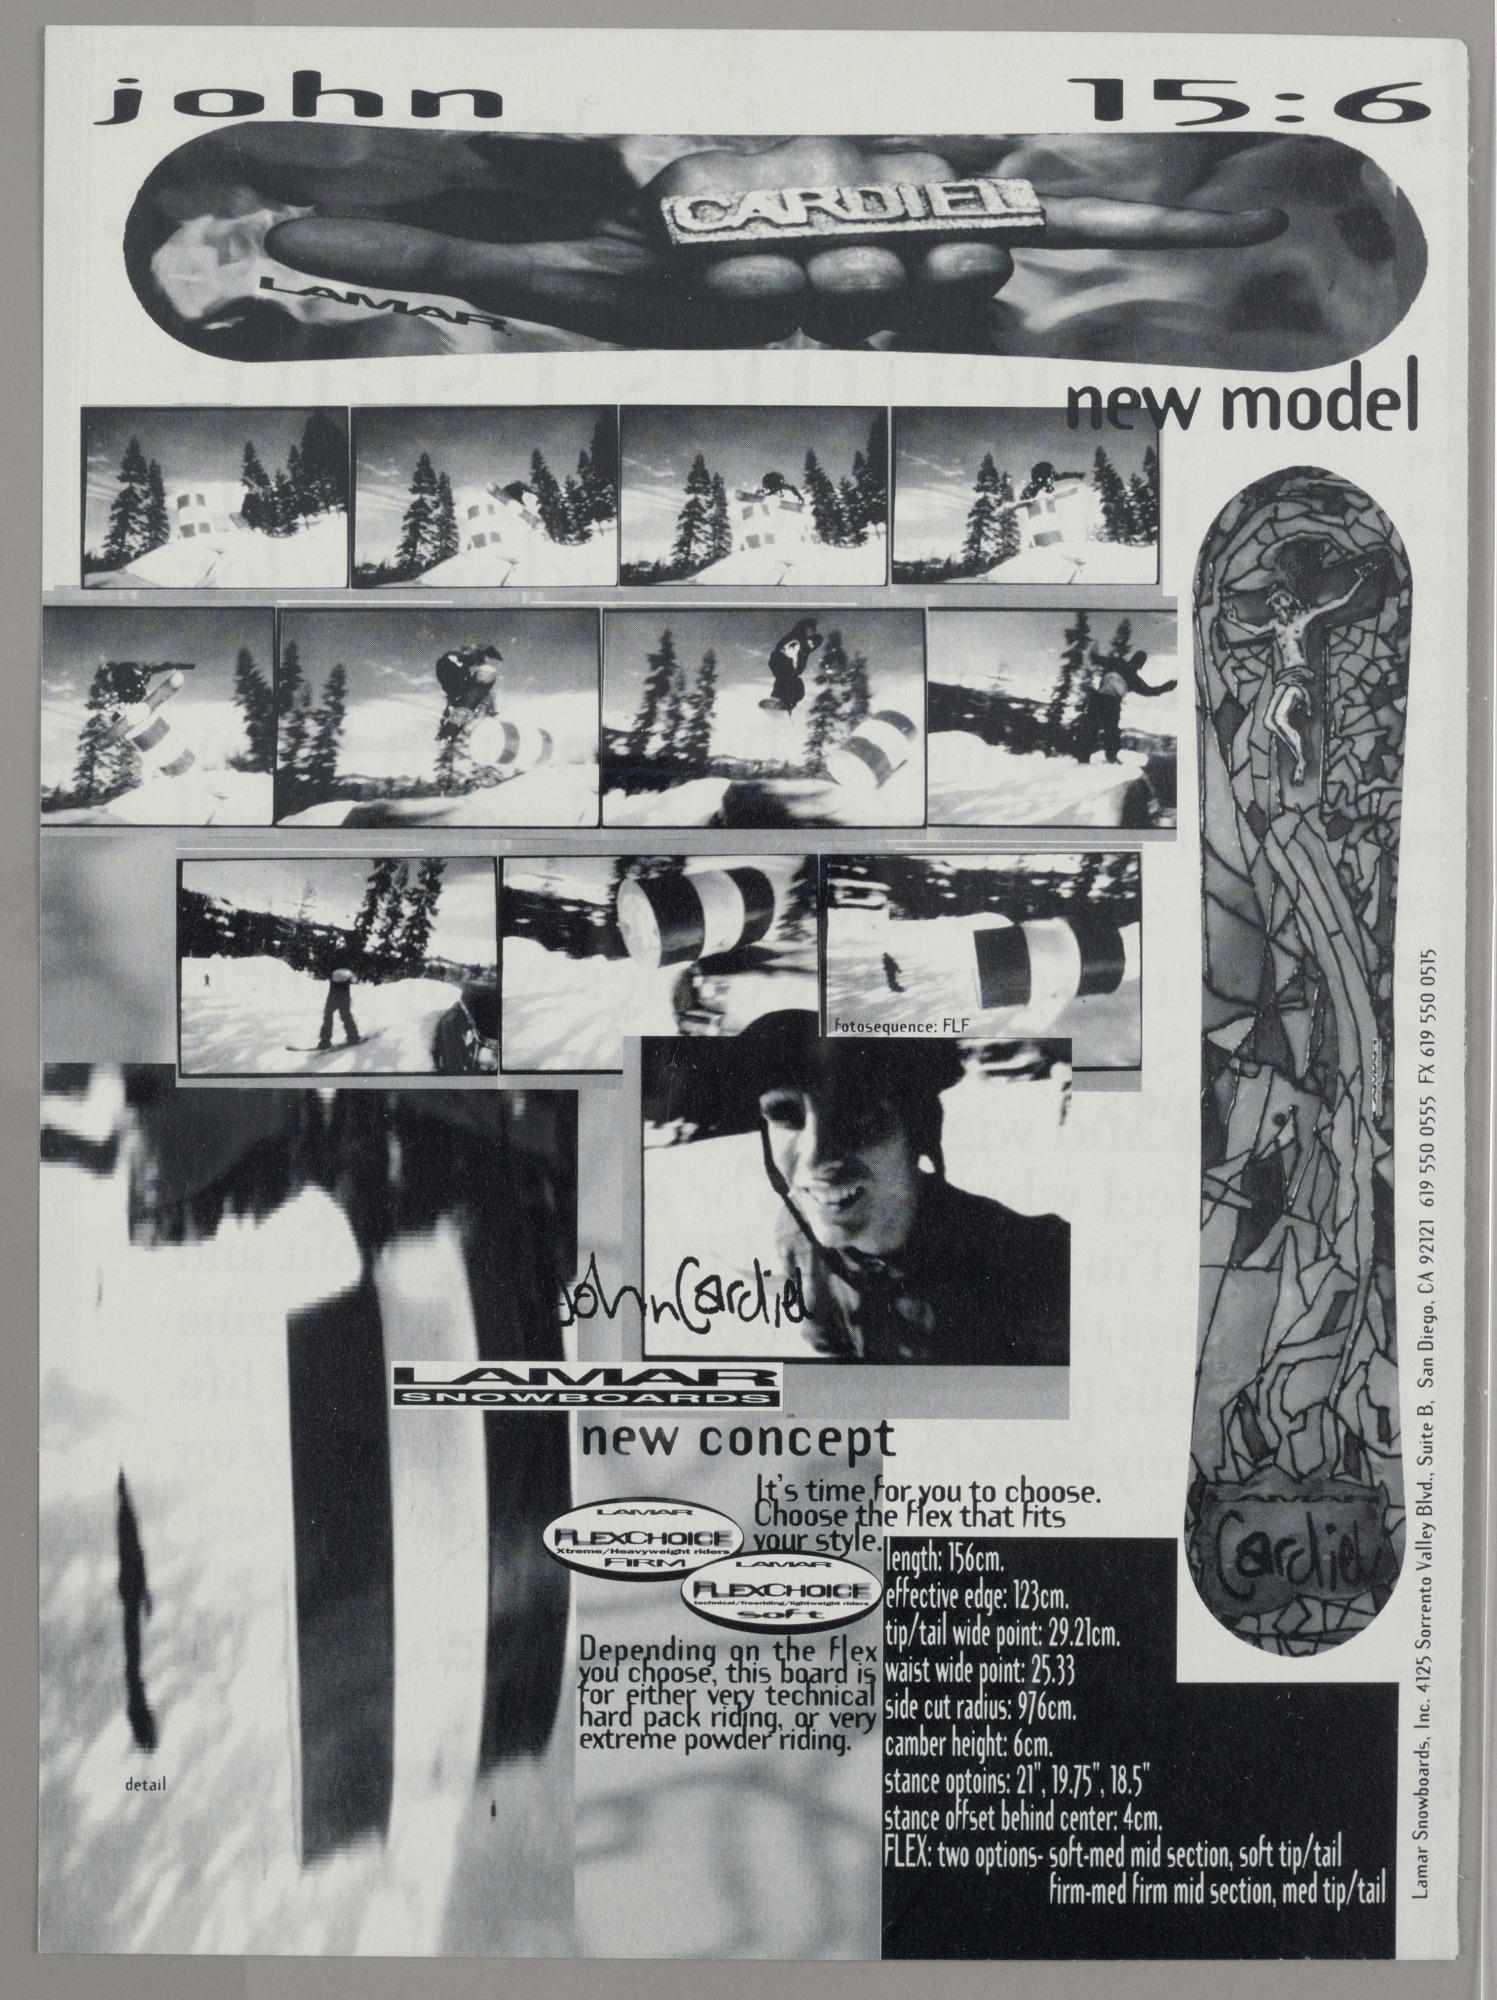 images for Burton Snowboard Madonna